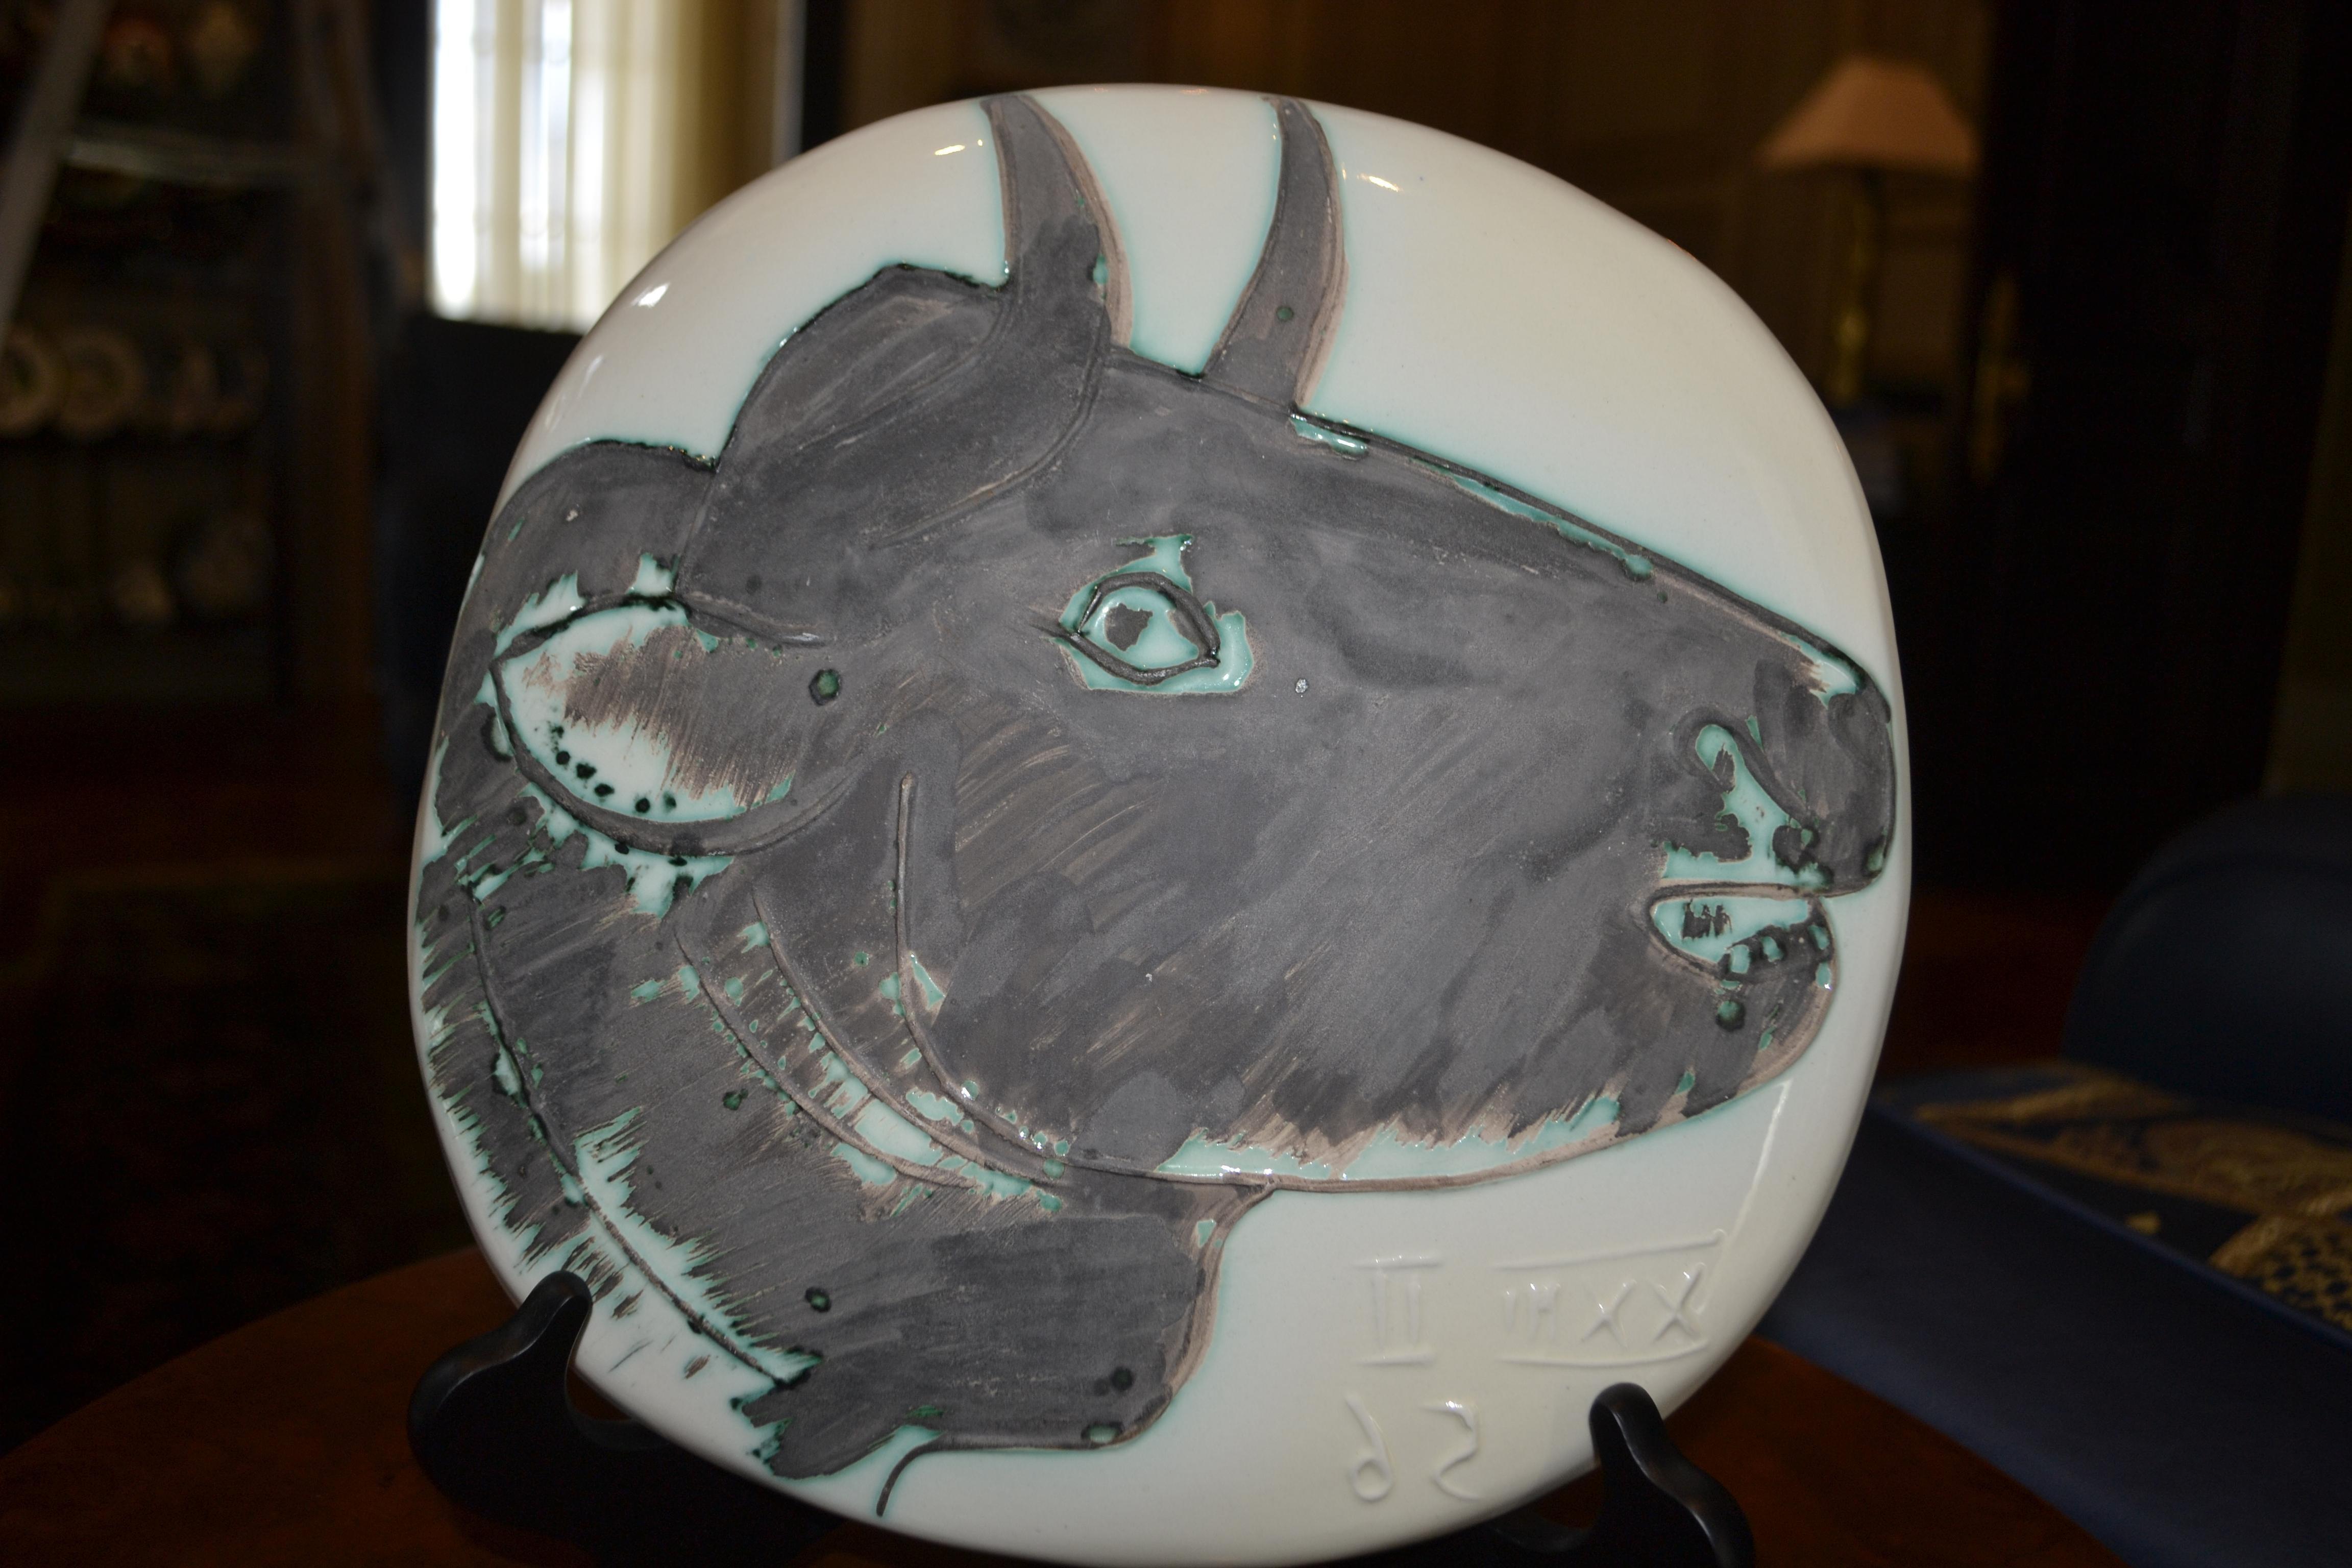 Ramie 317 Profile of the Bull Picasso Madoura Ceramic